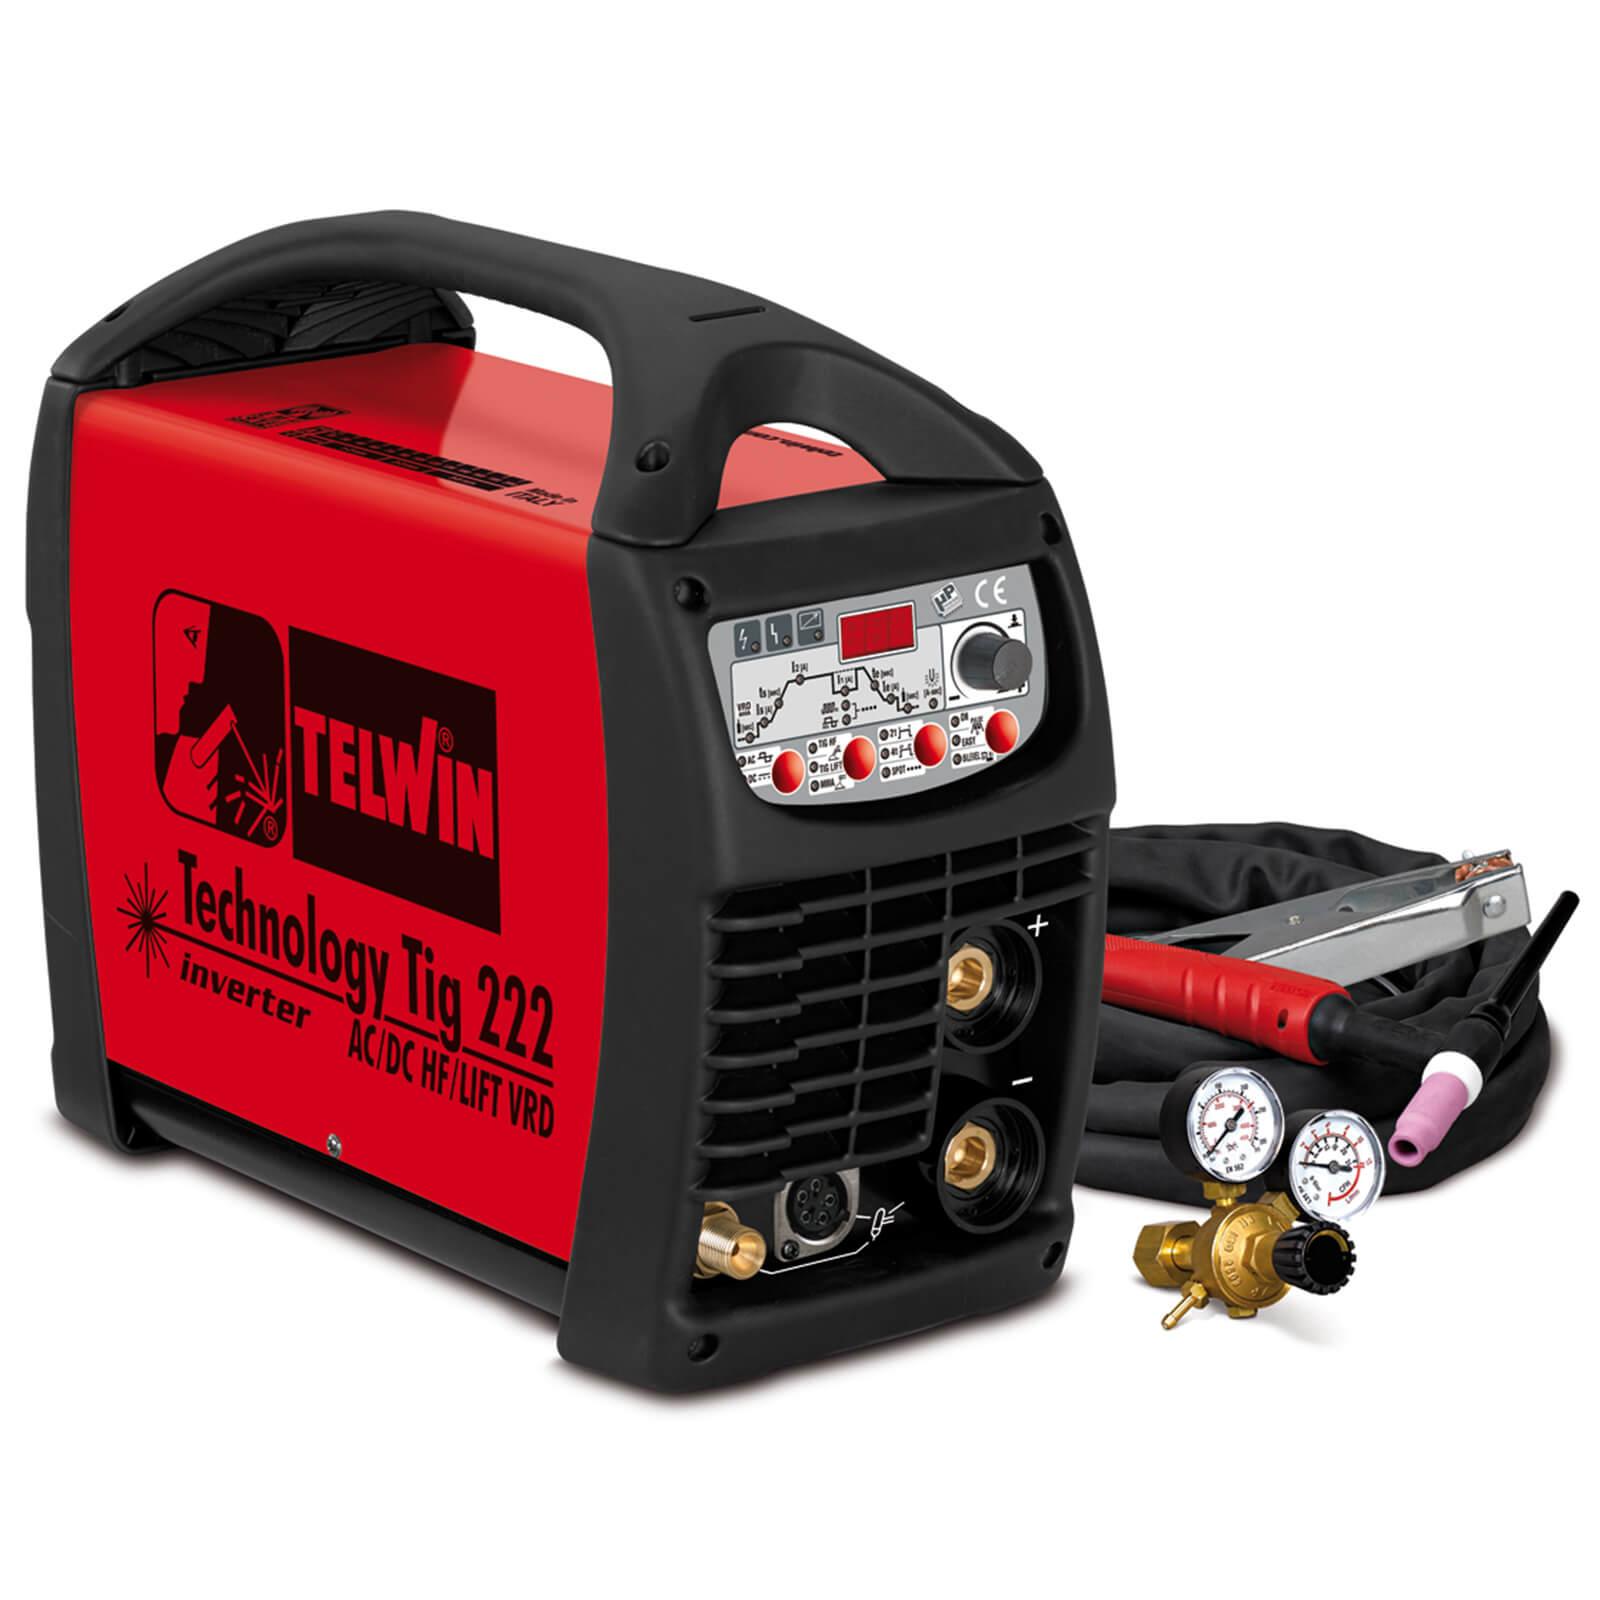 TELWIN Technology Tig 222 AC/DC-HF/Lift VRD Schweißgerät Inverter incl. Zubehör